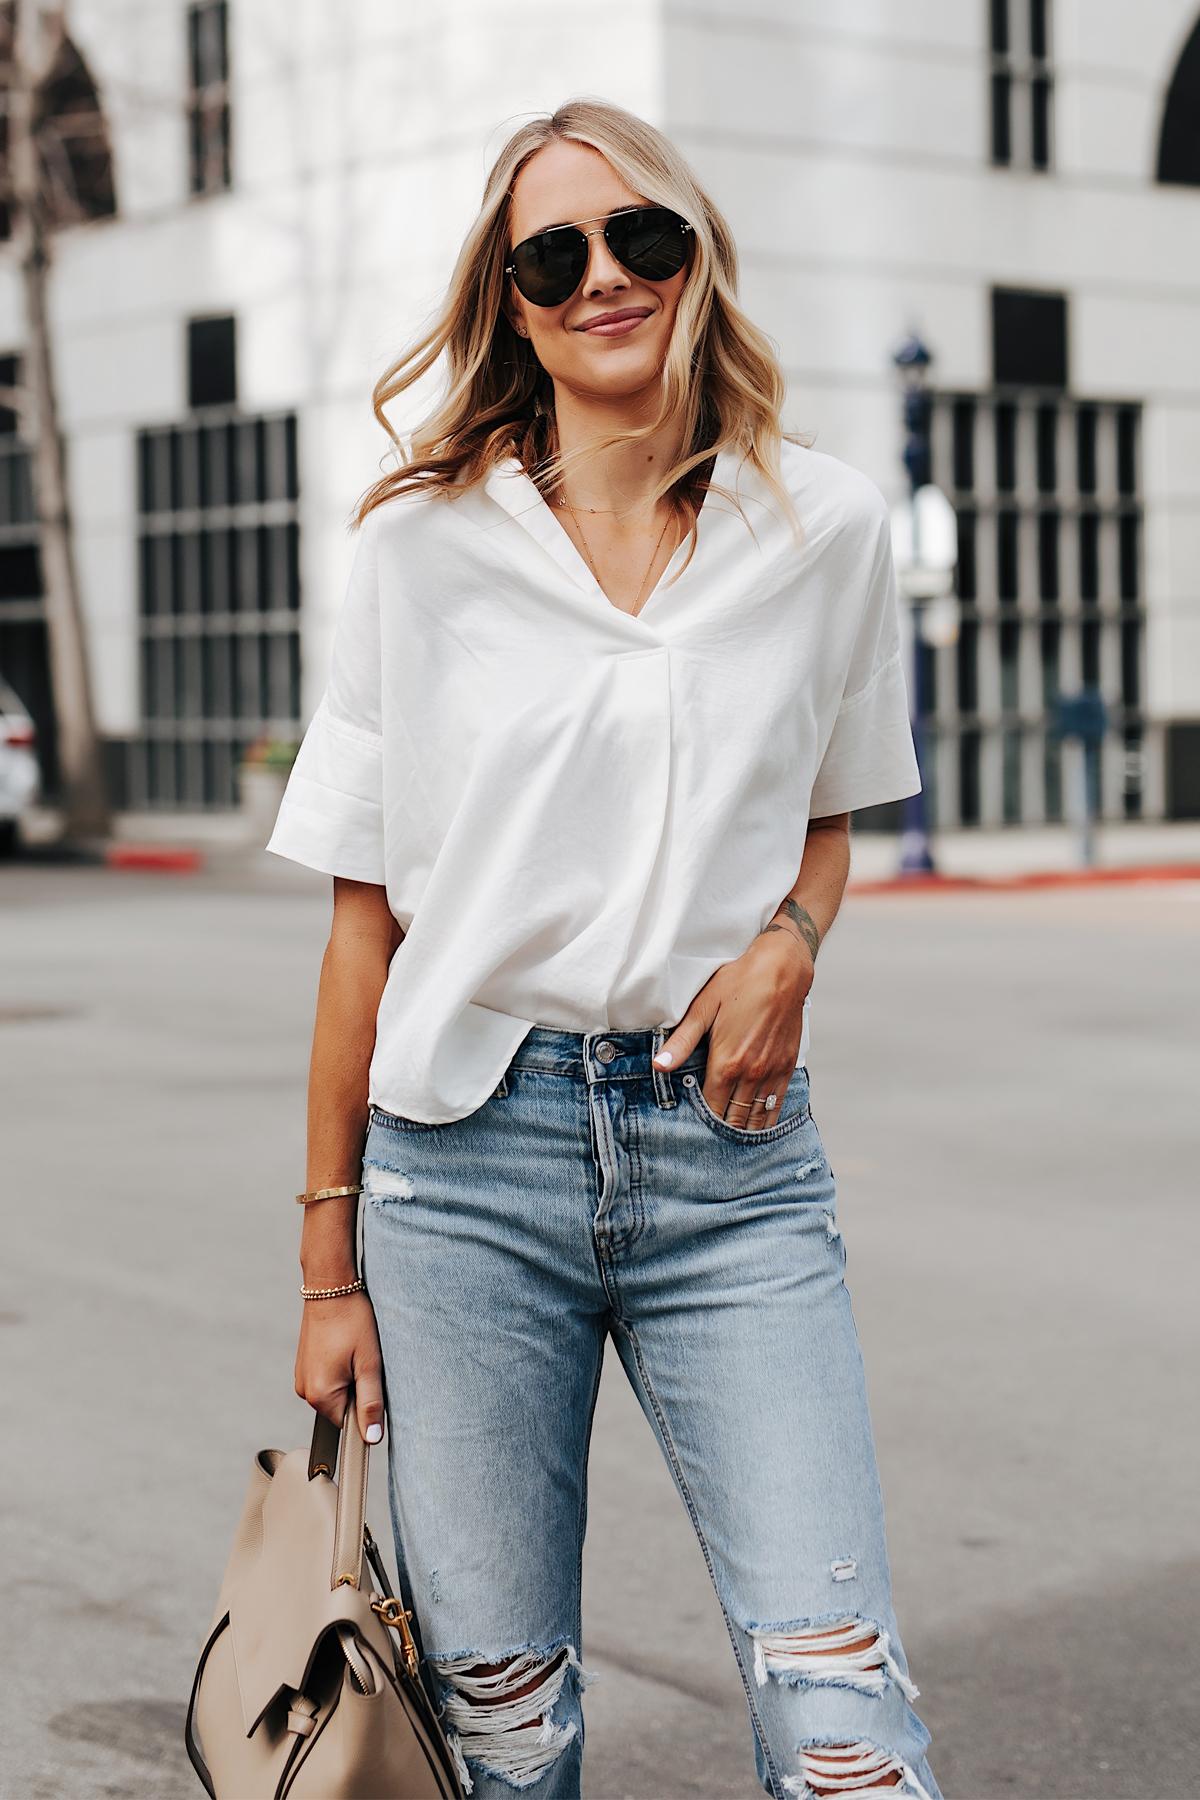 Fashion Jackson Wearing Short Sleeve White Shirt Ripped Jeans